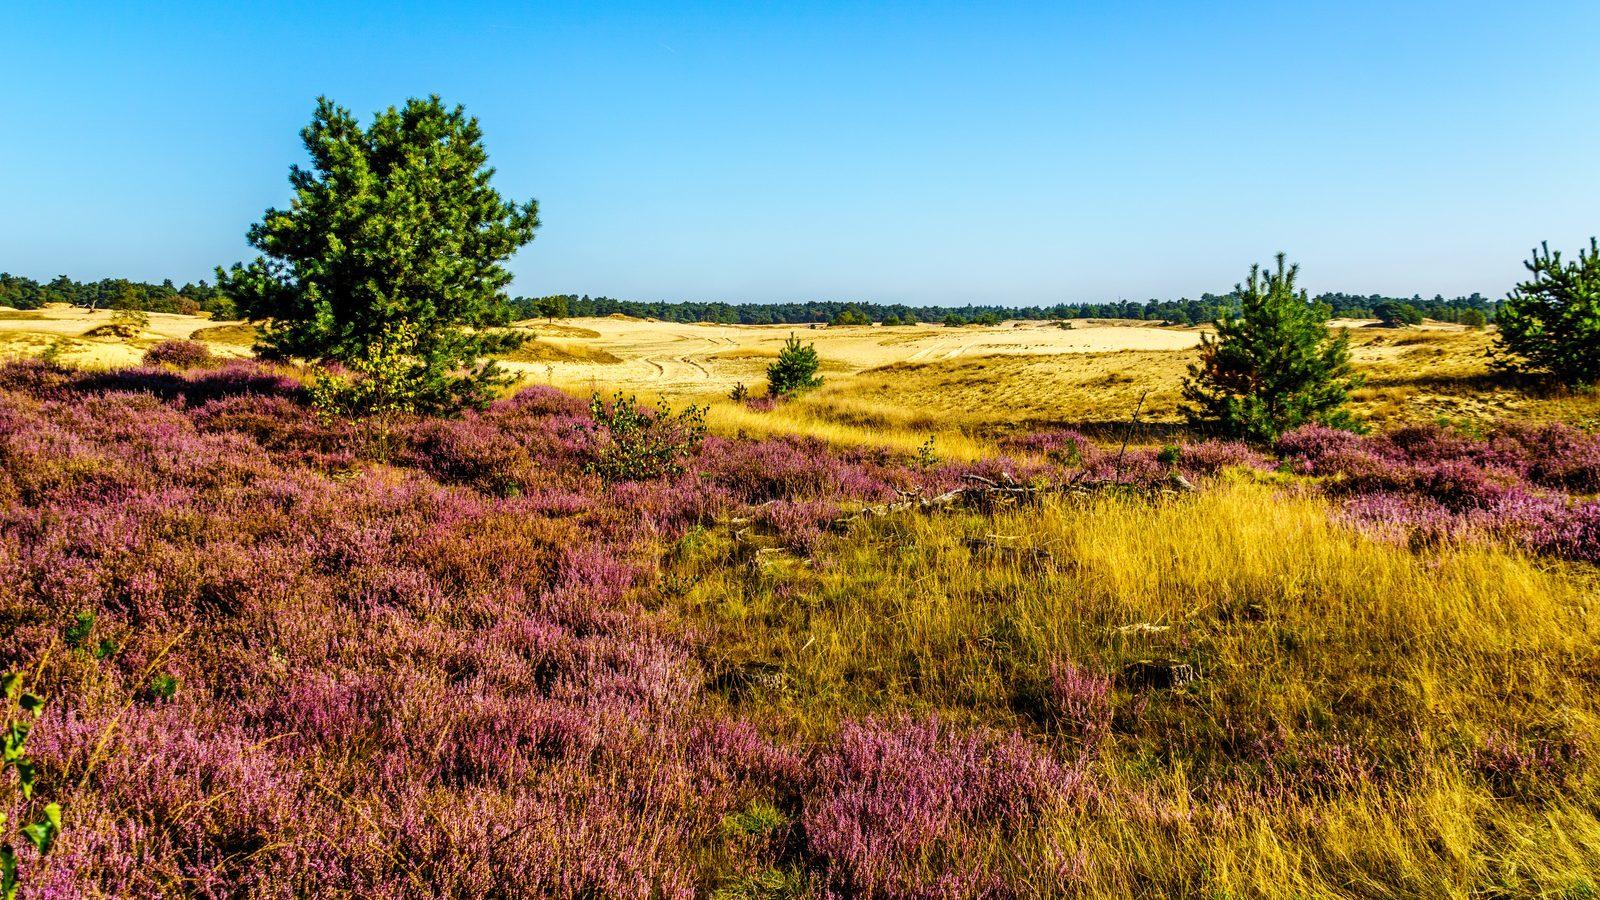 Gelderland most popular province among tourists